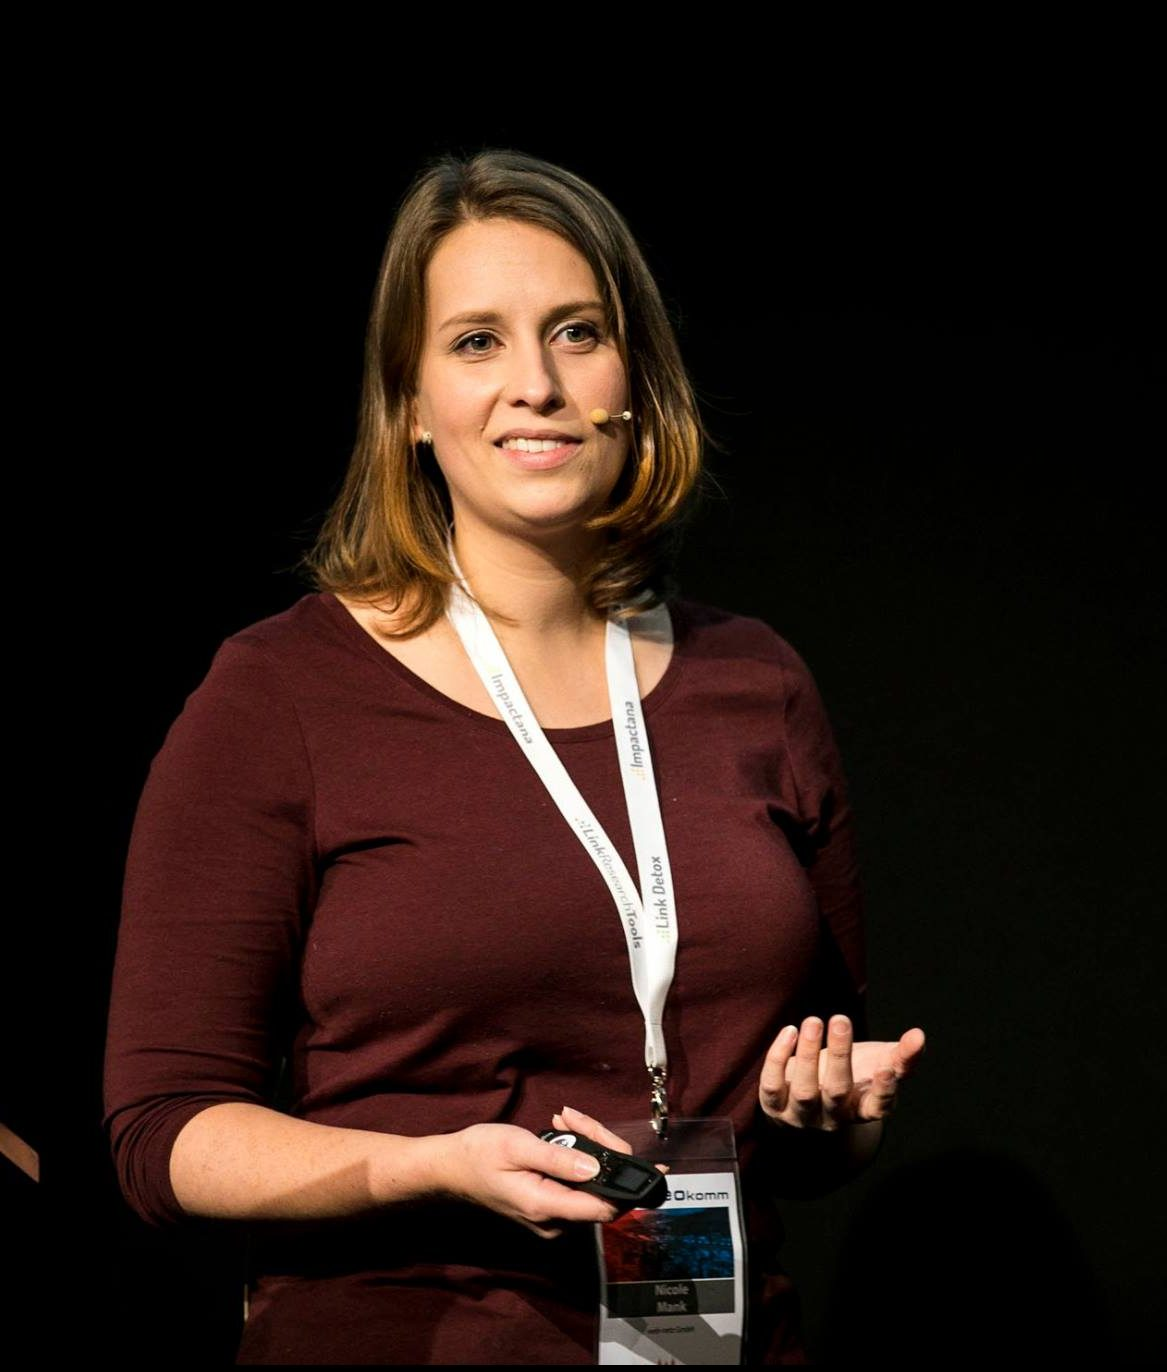 Nicole Mank